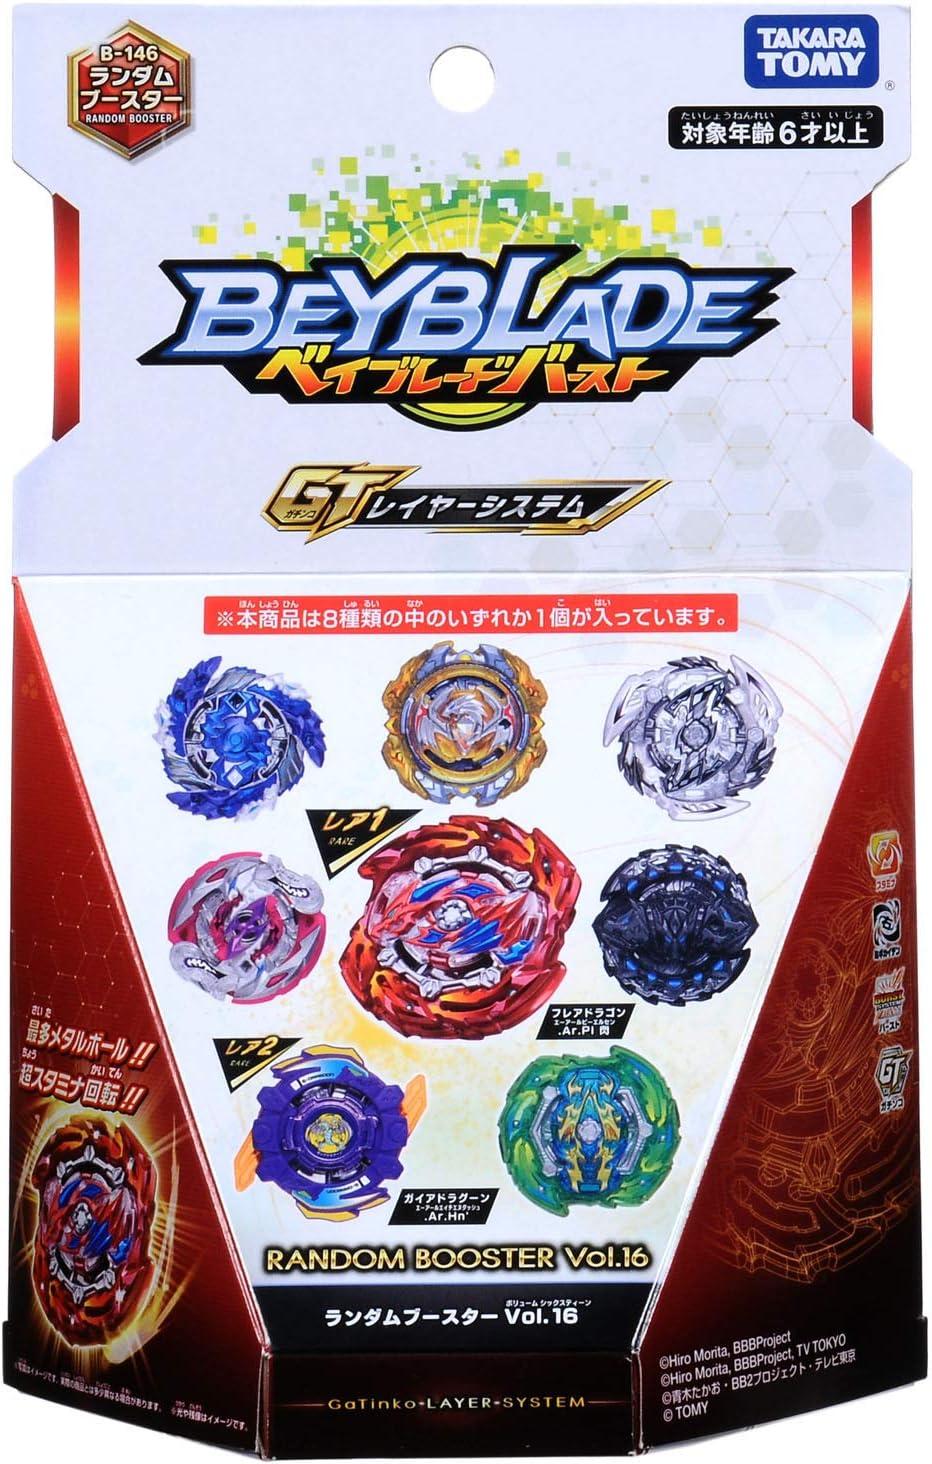 Takara Tomy Beyblade BURST GT B-140 Random Booster Vol.15 Random Item Inside